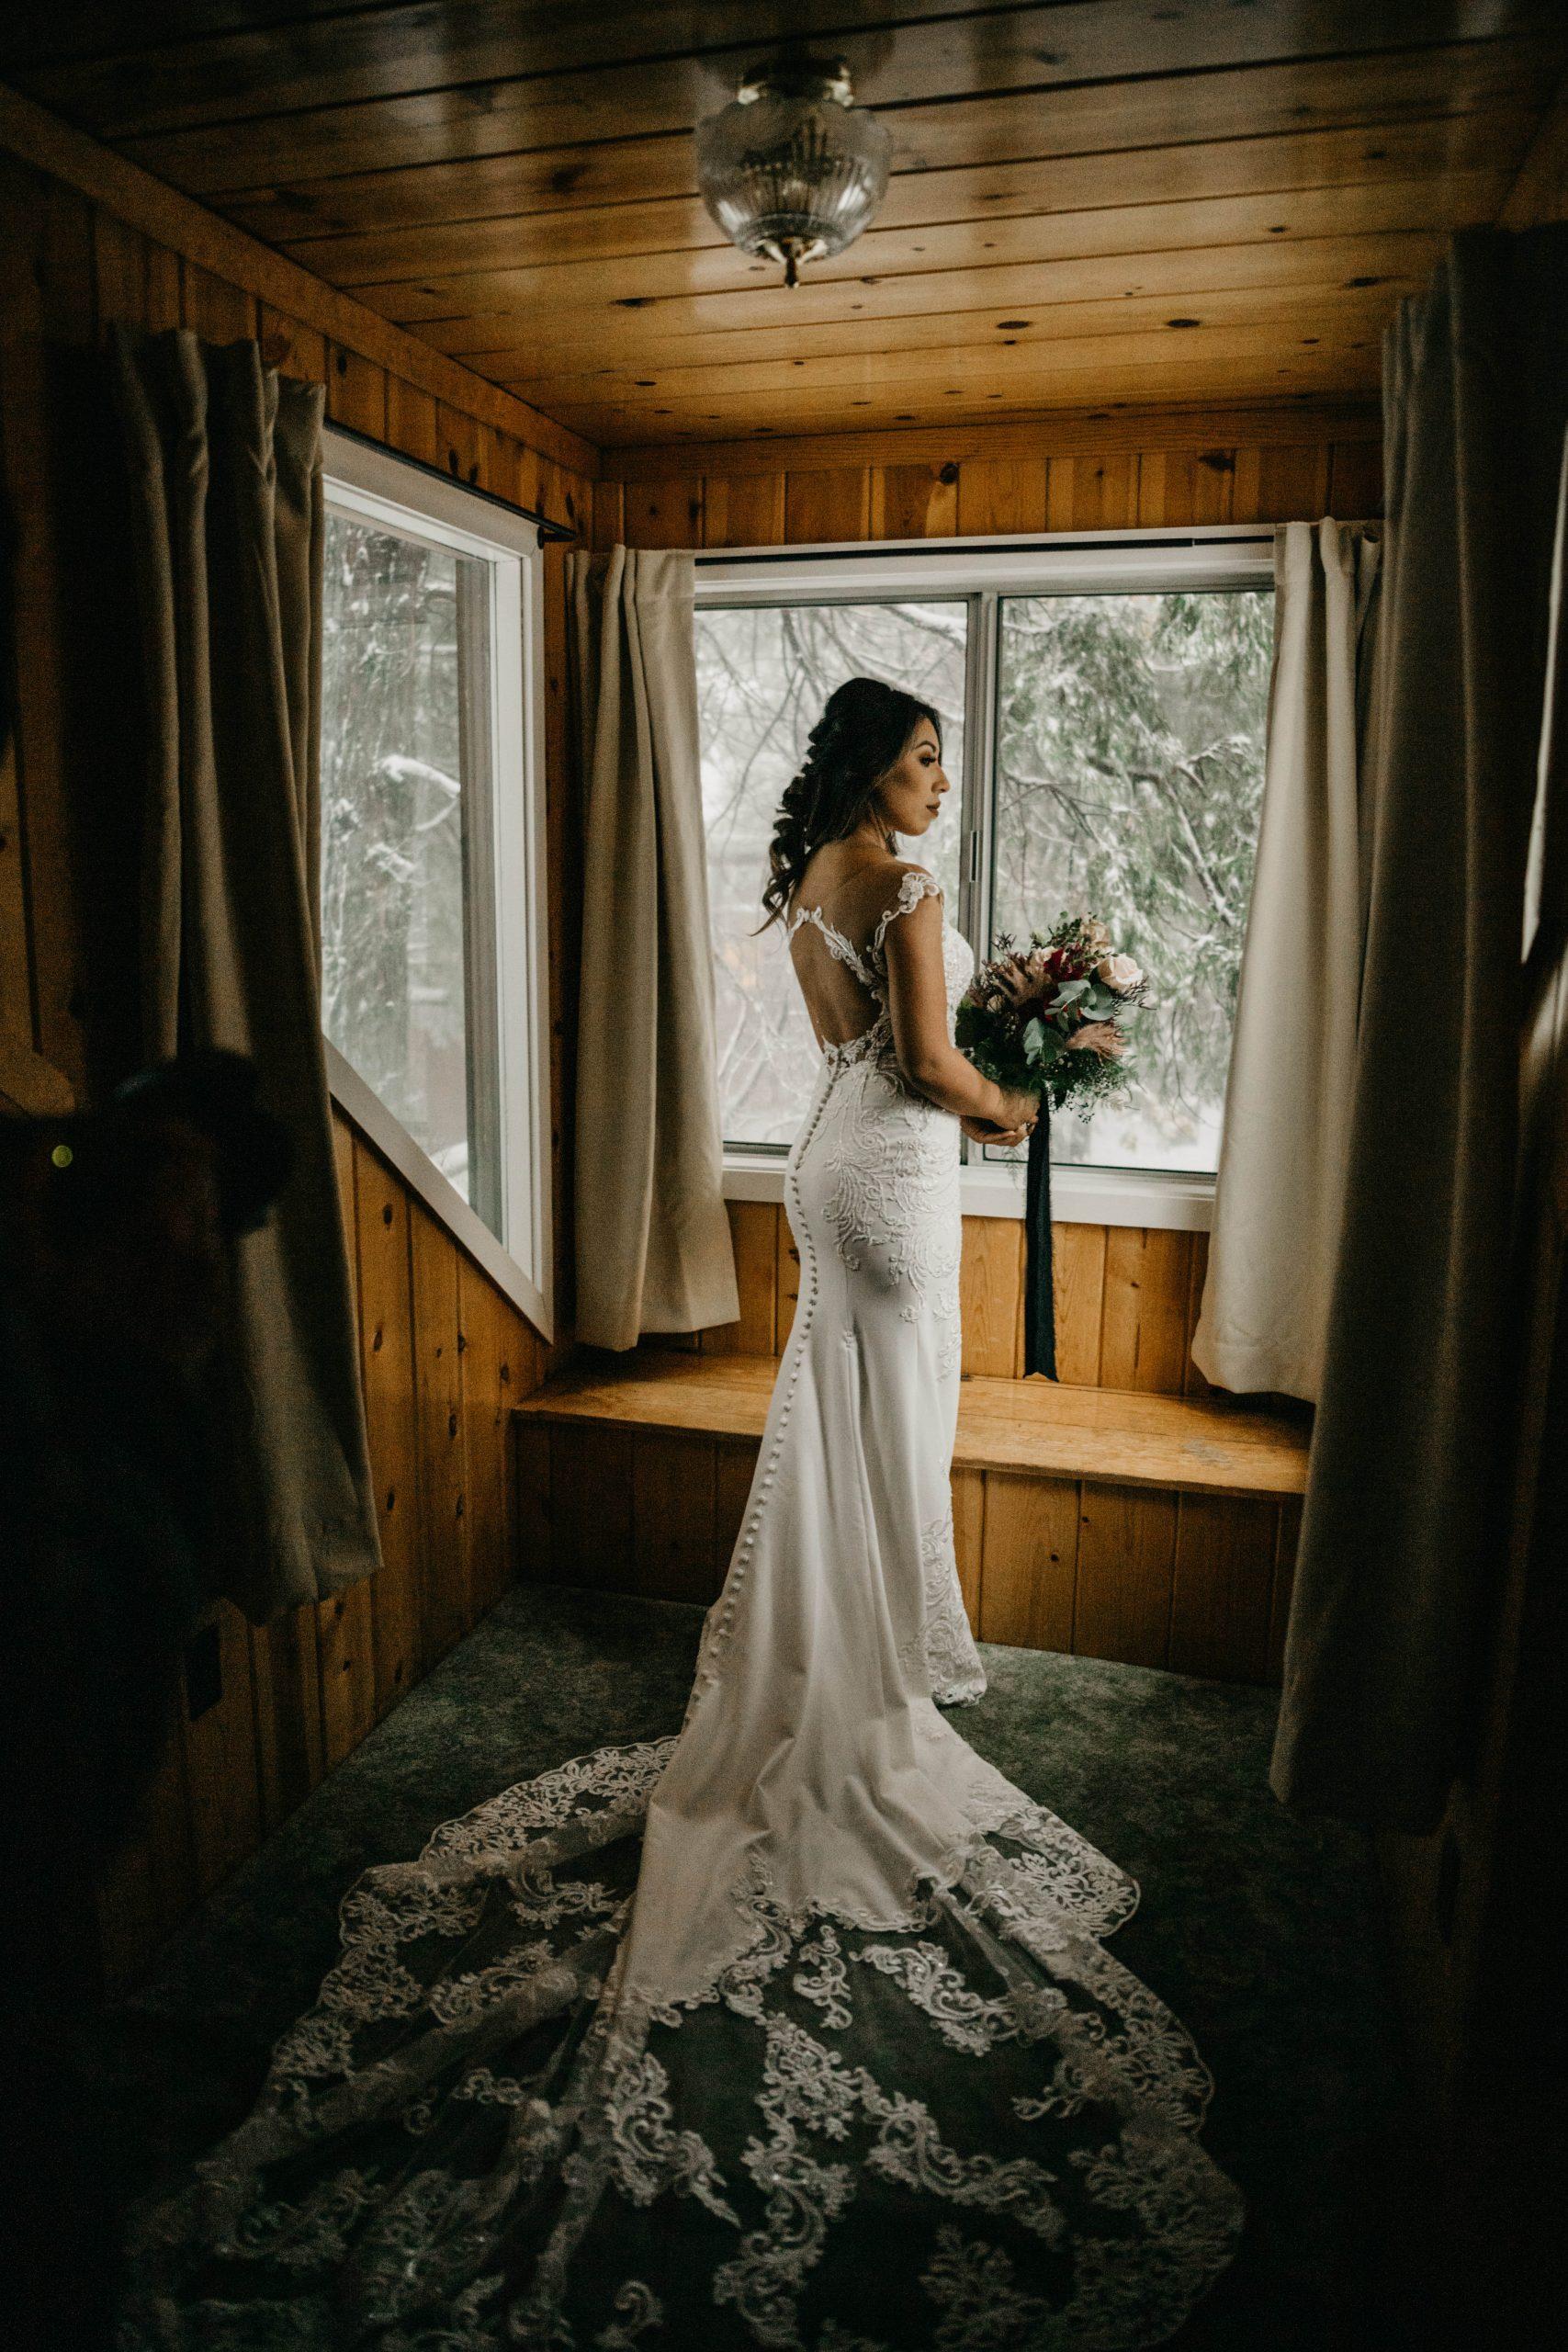 Beautiful Bride portrait, image by Fatima Elreda Photo